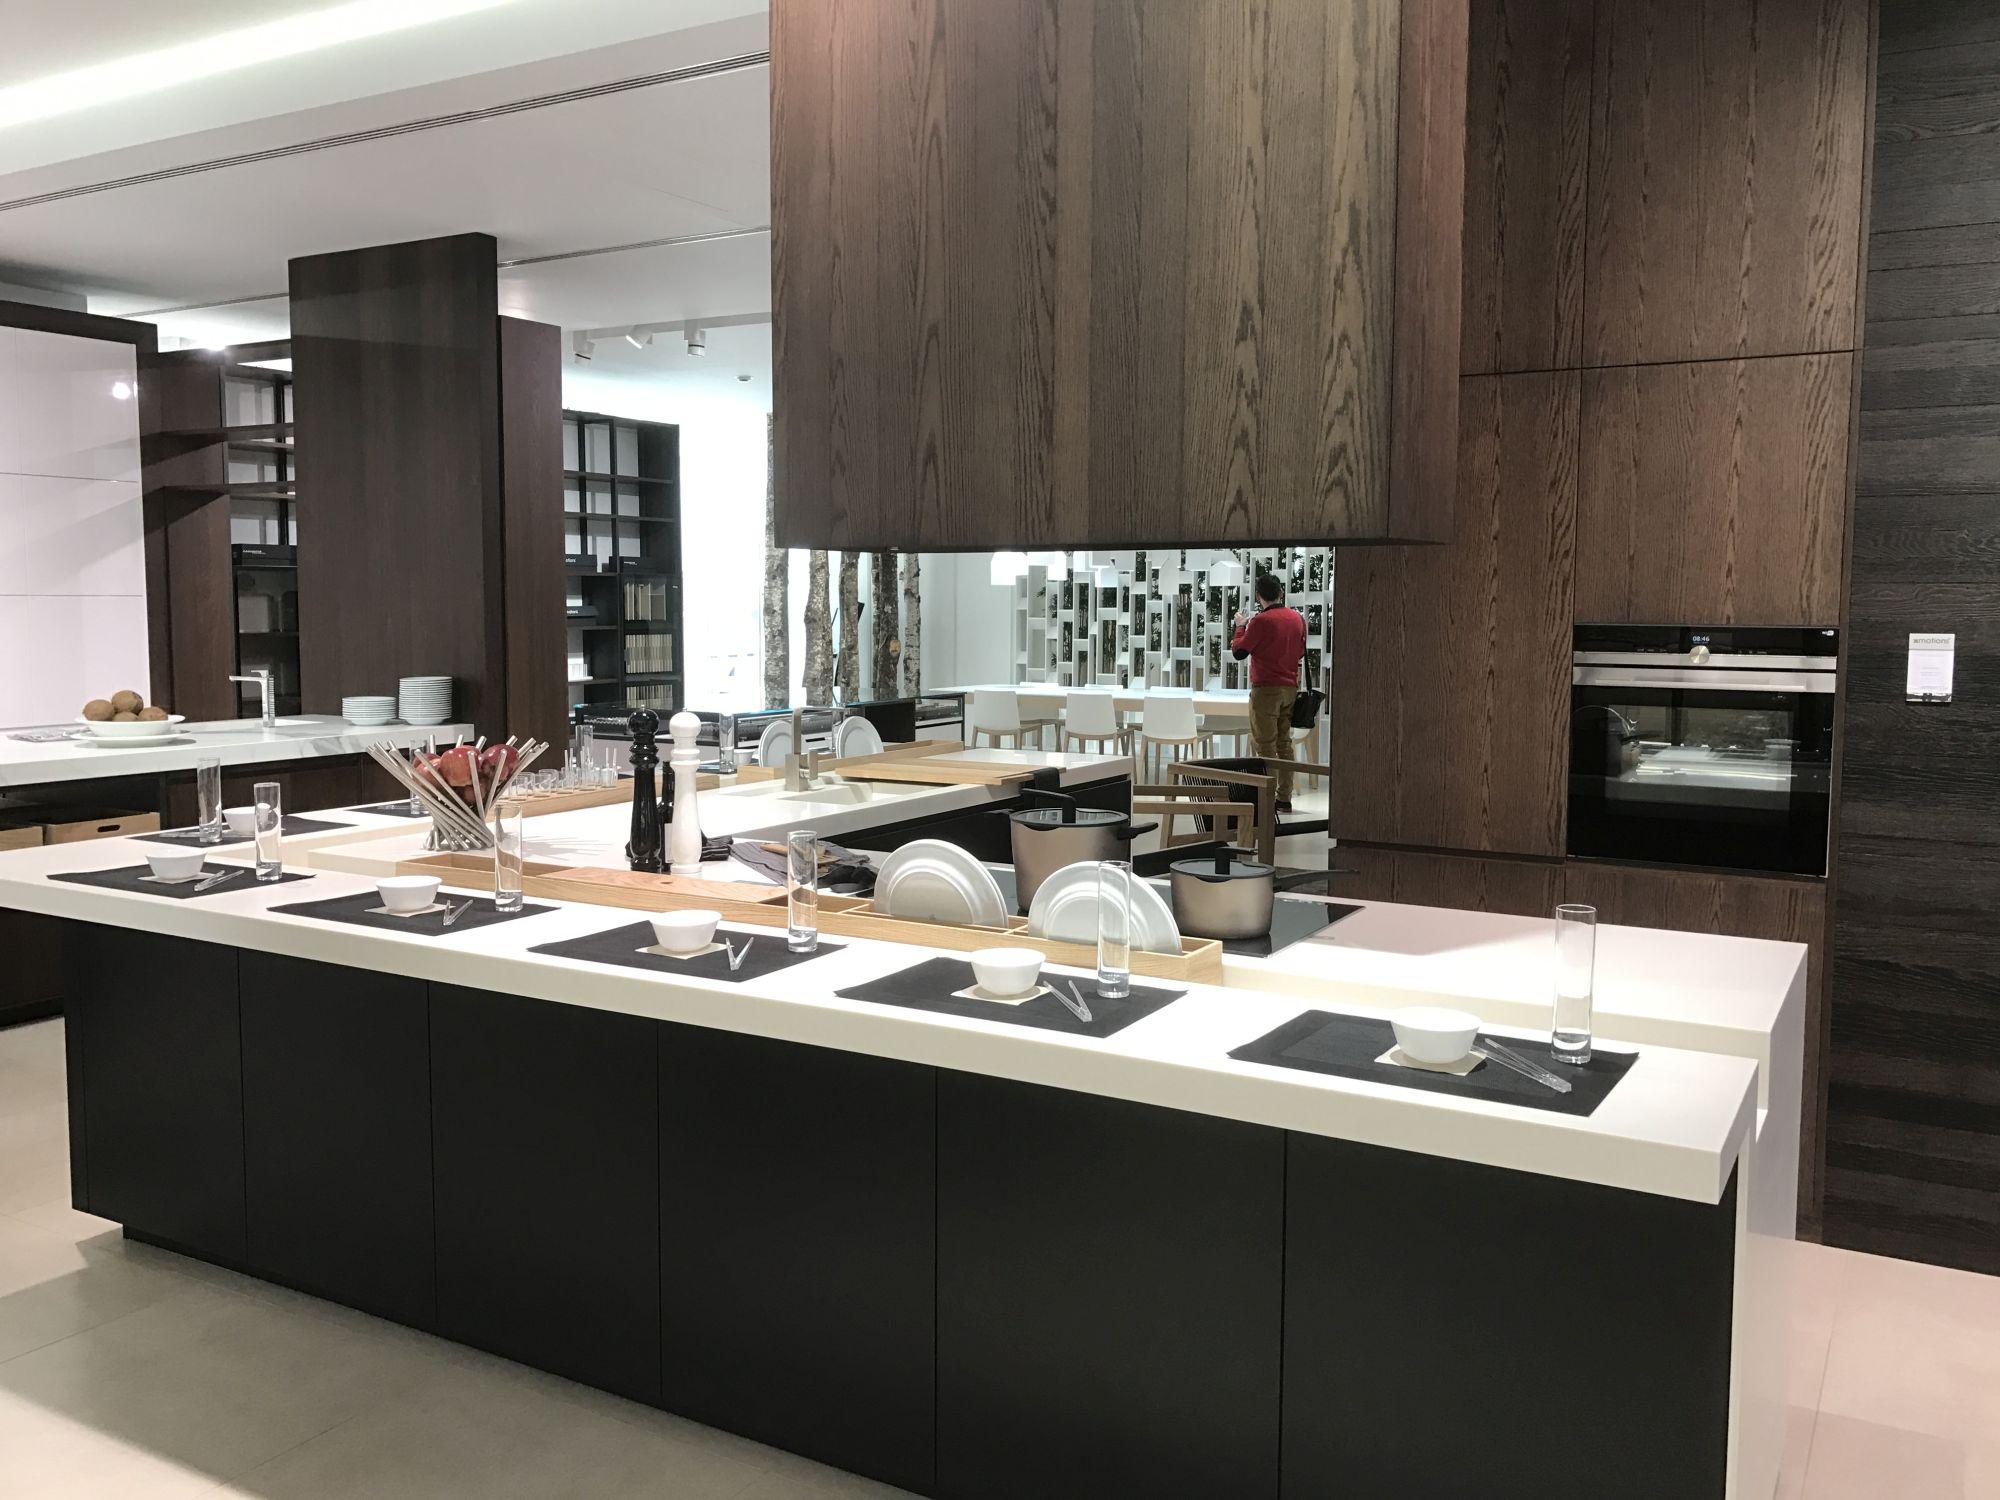 Luxurious-kitchen-design-GamaDecor